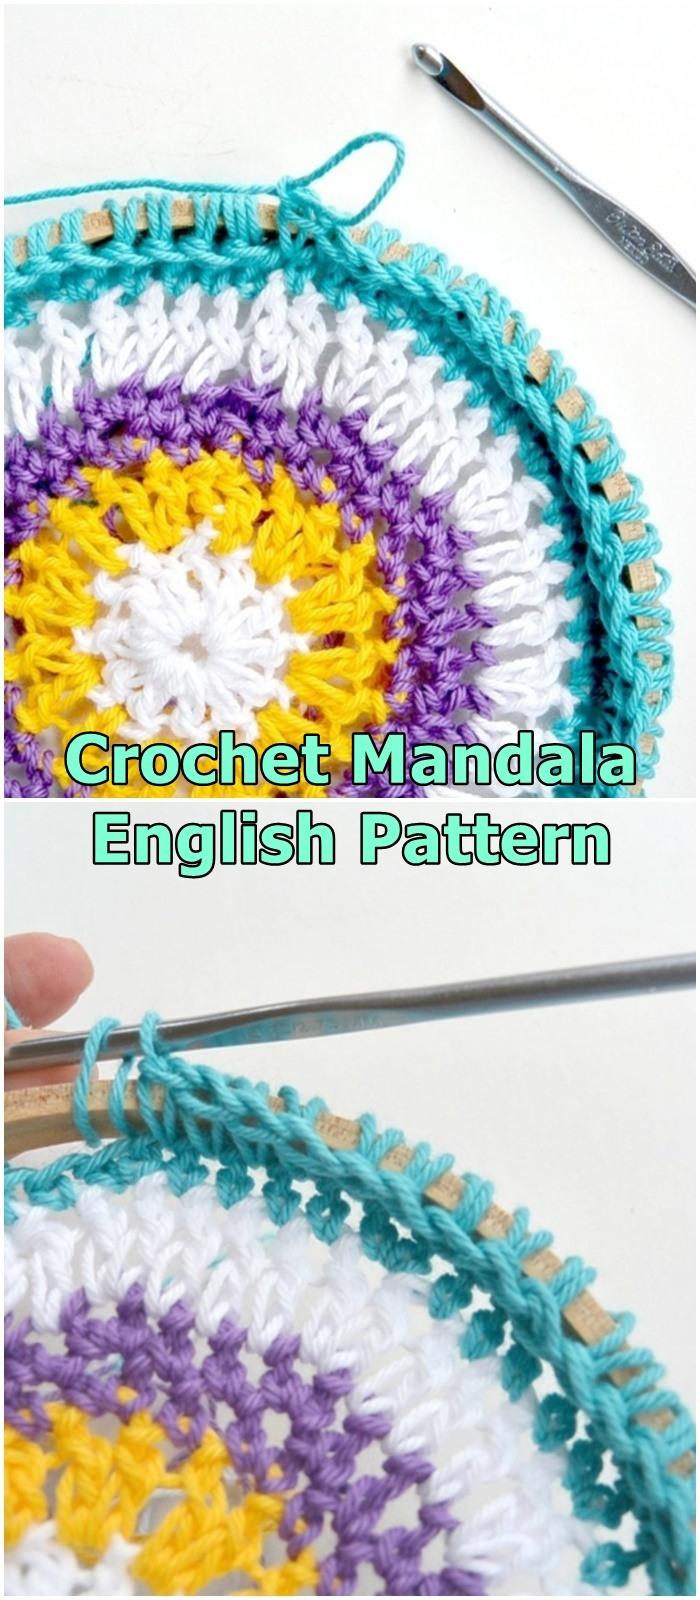 Crochet Mandala Hoops / Wall Hangings